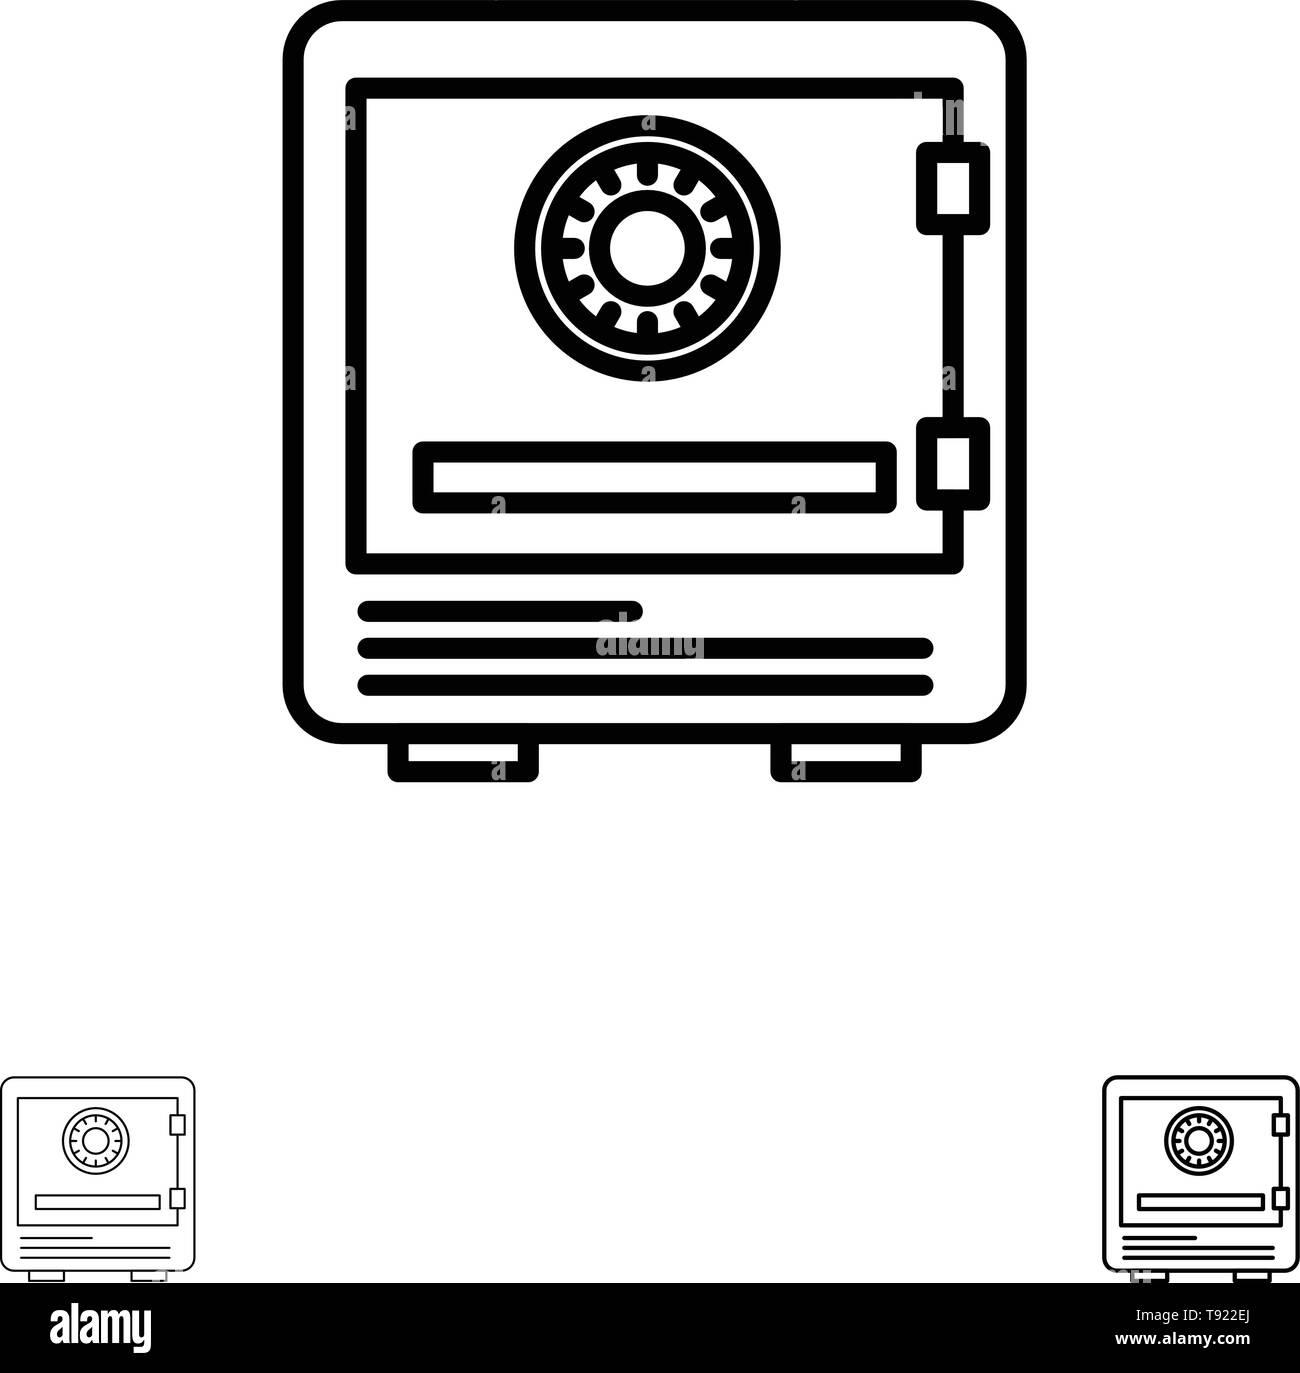 Safe, Bank, Deposit, Lock, Money, Safety, Security Bold and thin black line icon set - Stock Image